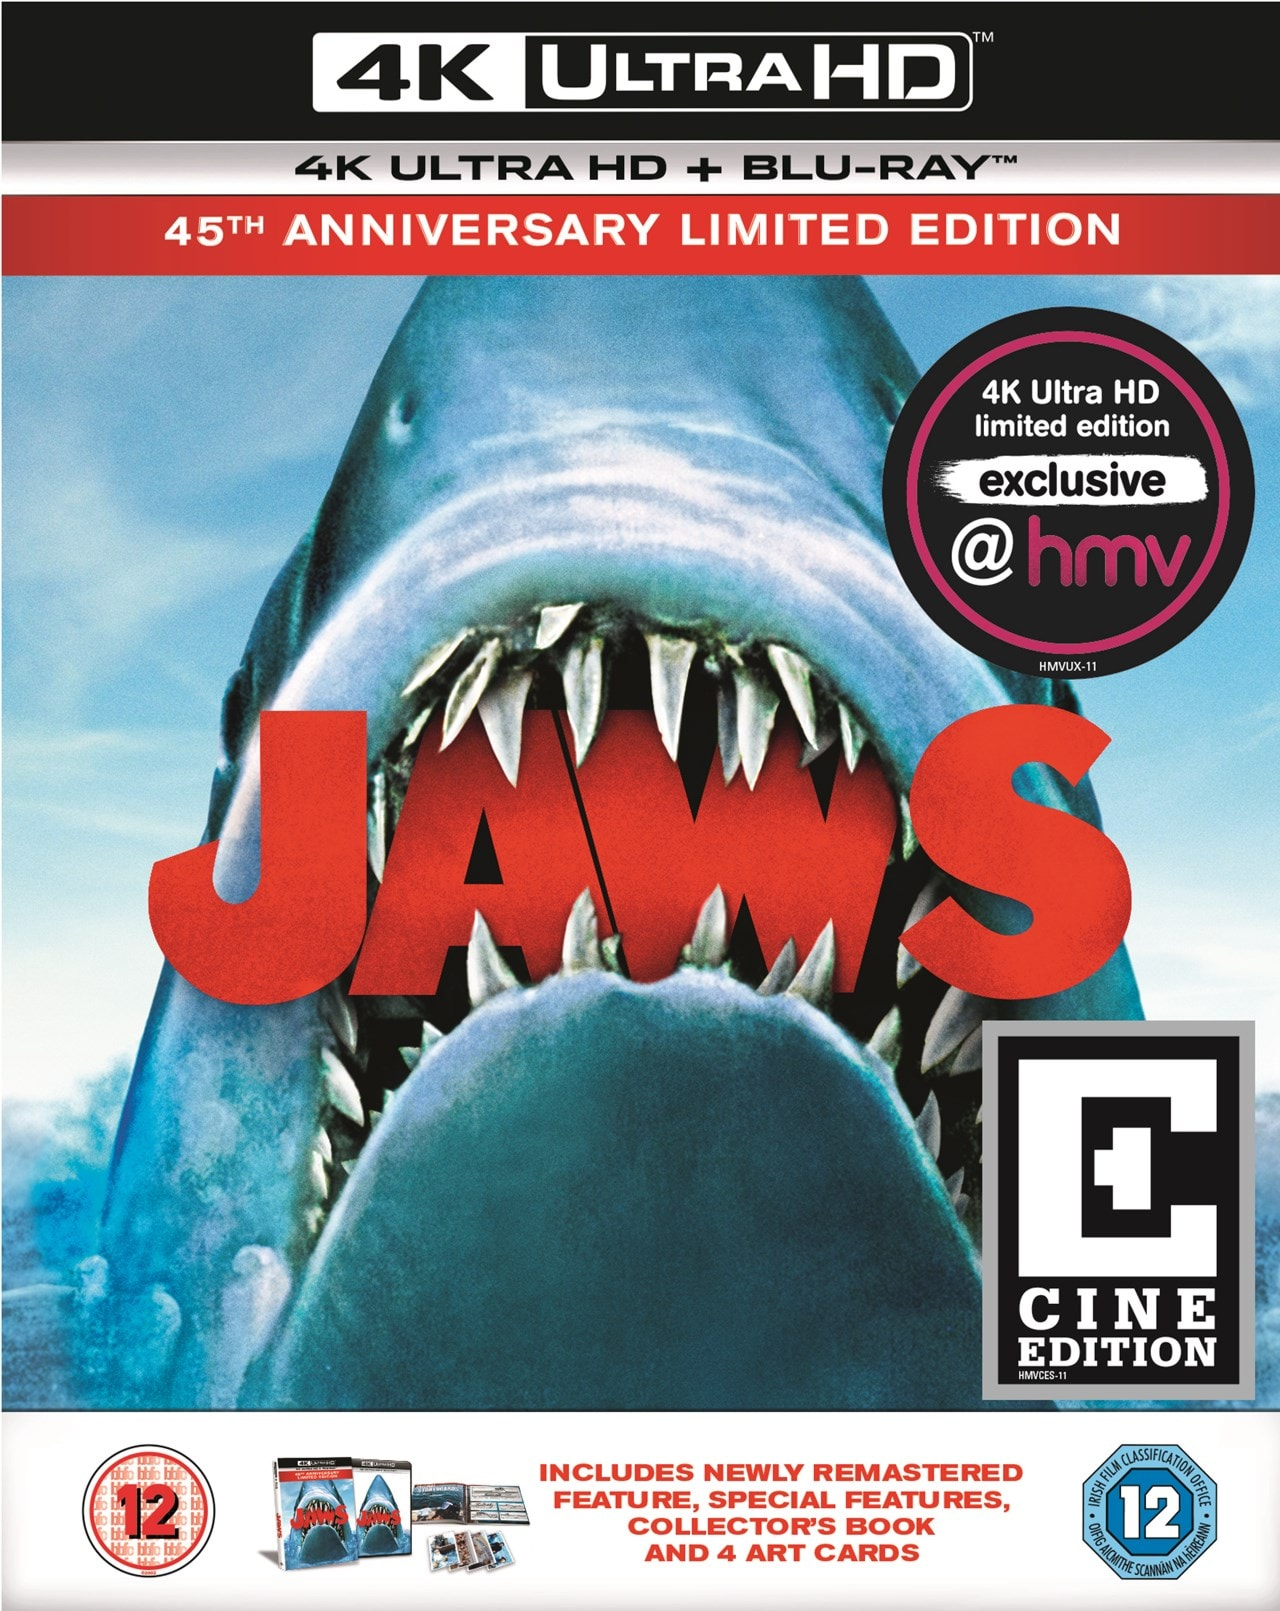 Jaws (hmv exclusive) - Cine Edition - 2